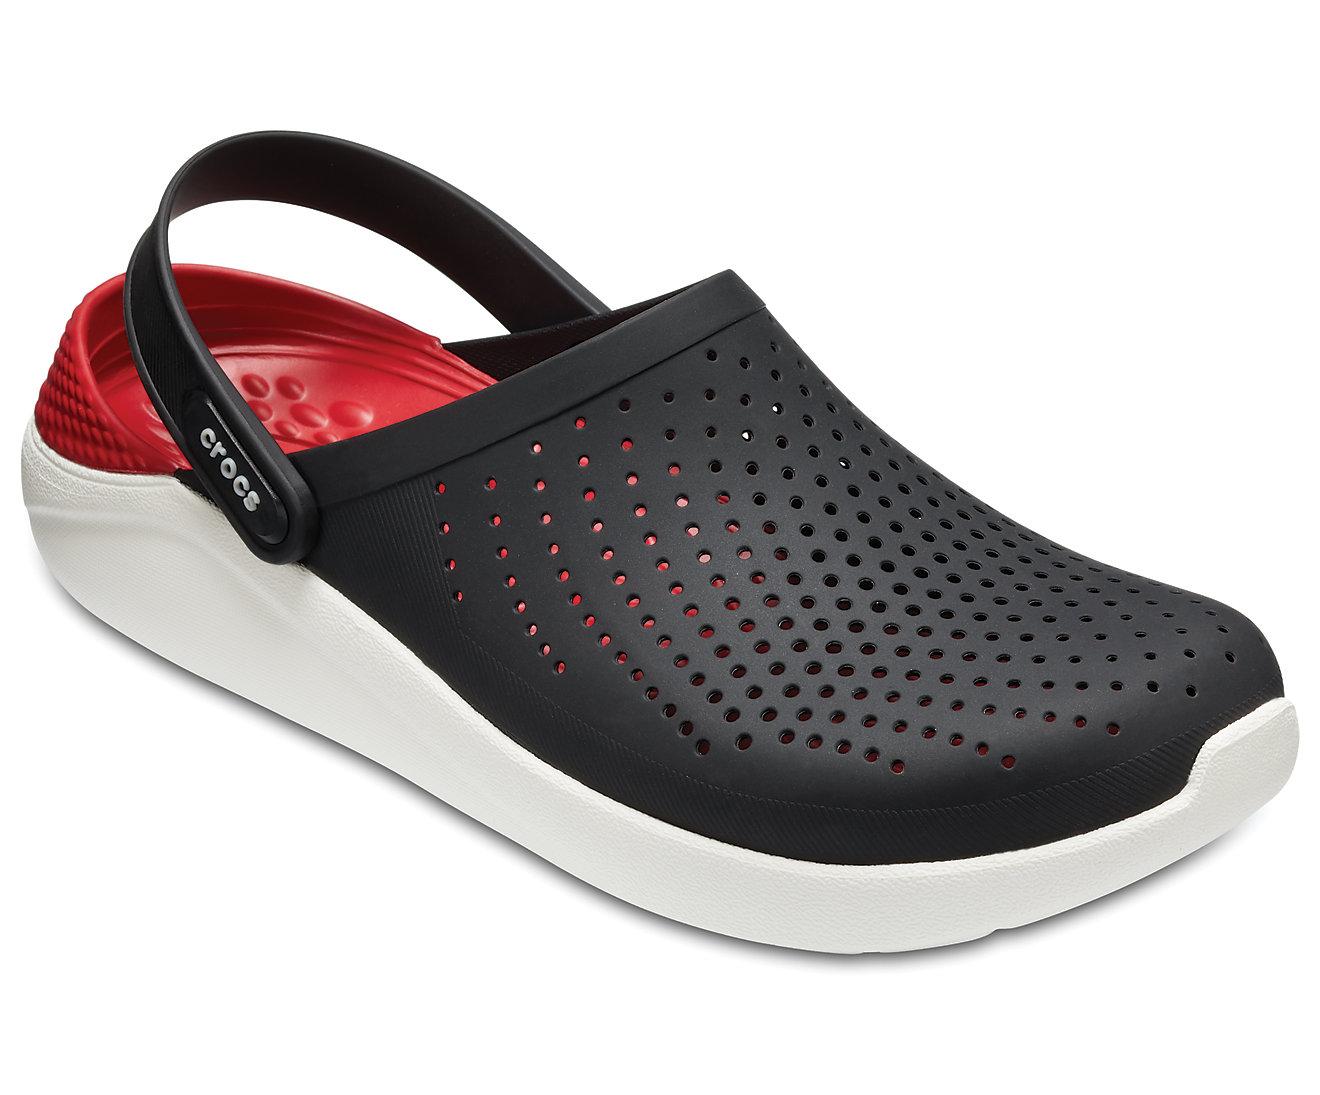 32c8dcd7f2 Sandalia Crocs Lite Ride Clog 204592 Masculino Feminino